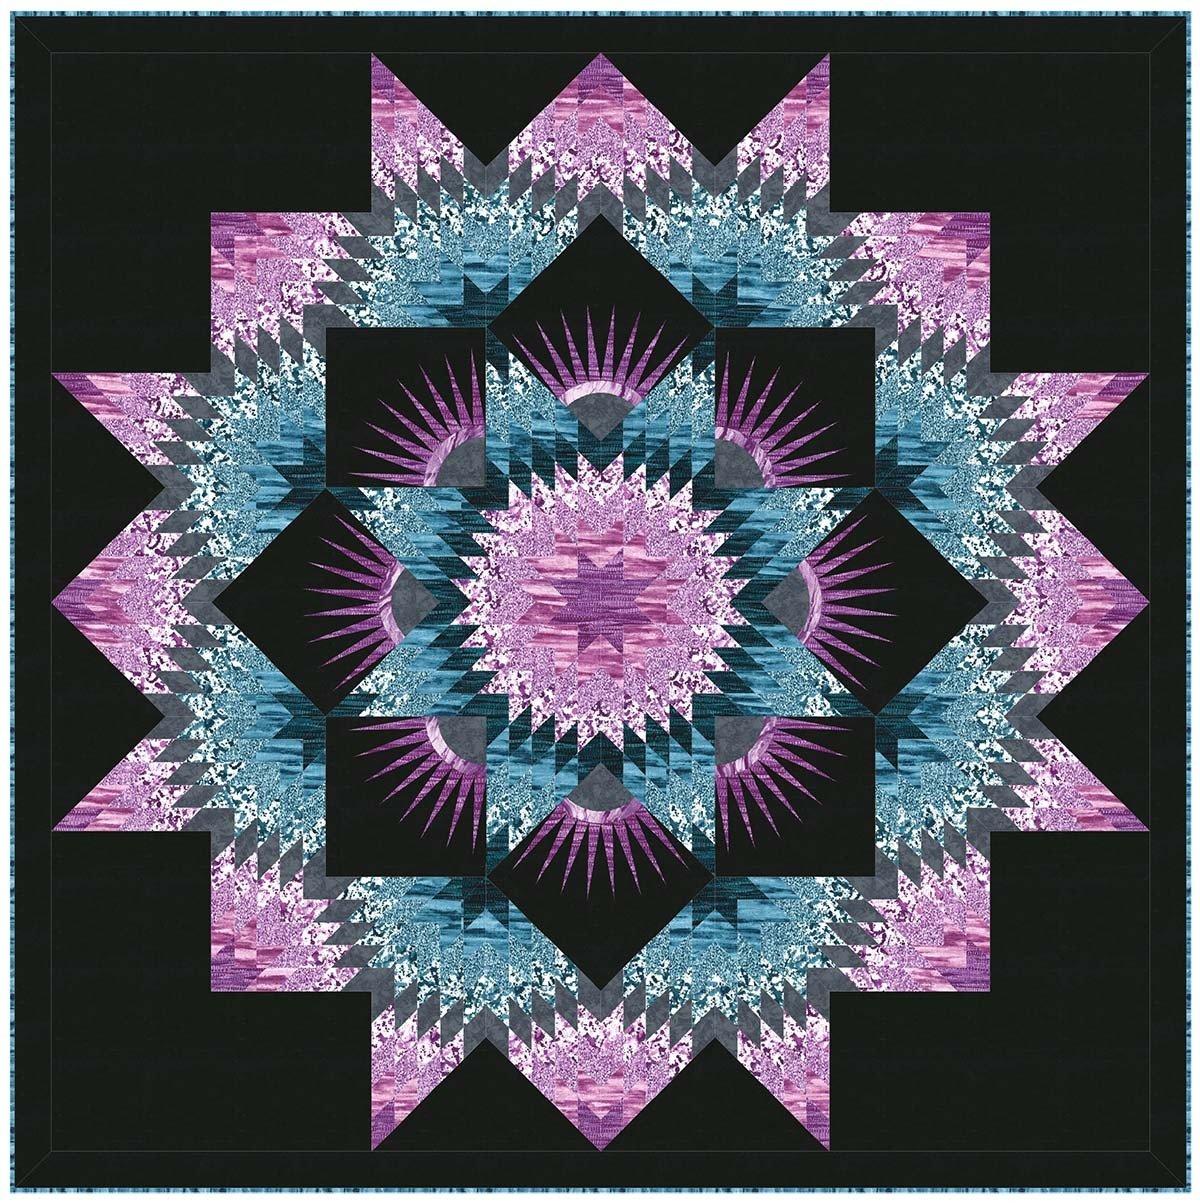 Michael Miller Mardi Gras Quilt KIT using Strata  by Christine Stainbrook KIT0179 $225.00 / kit